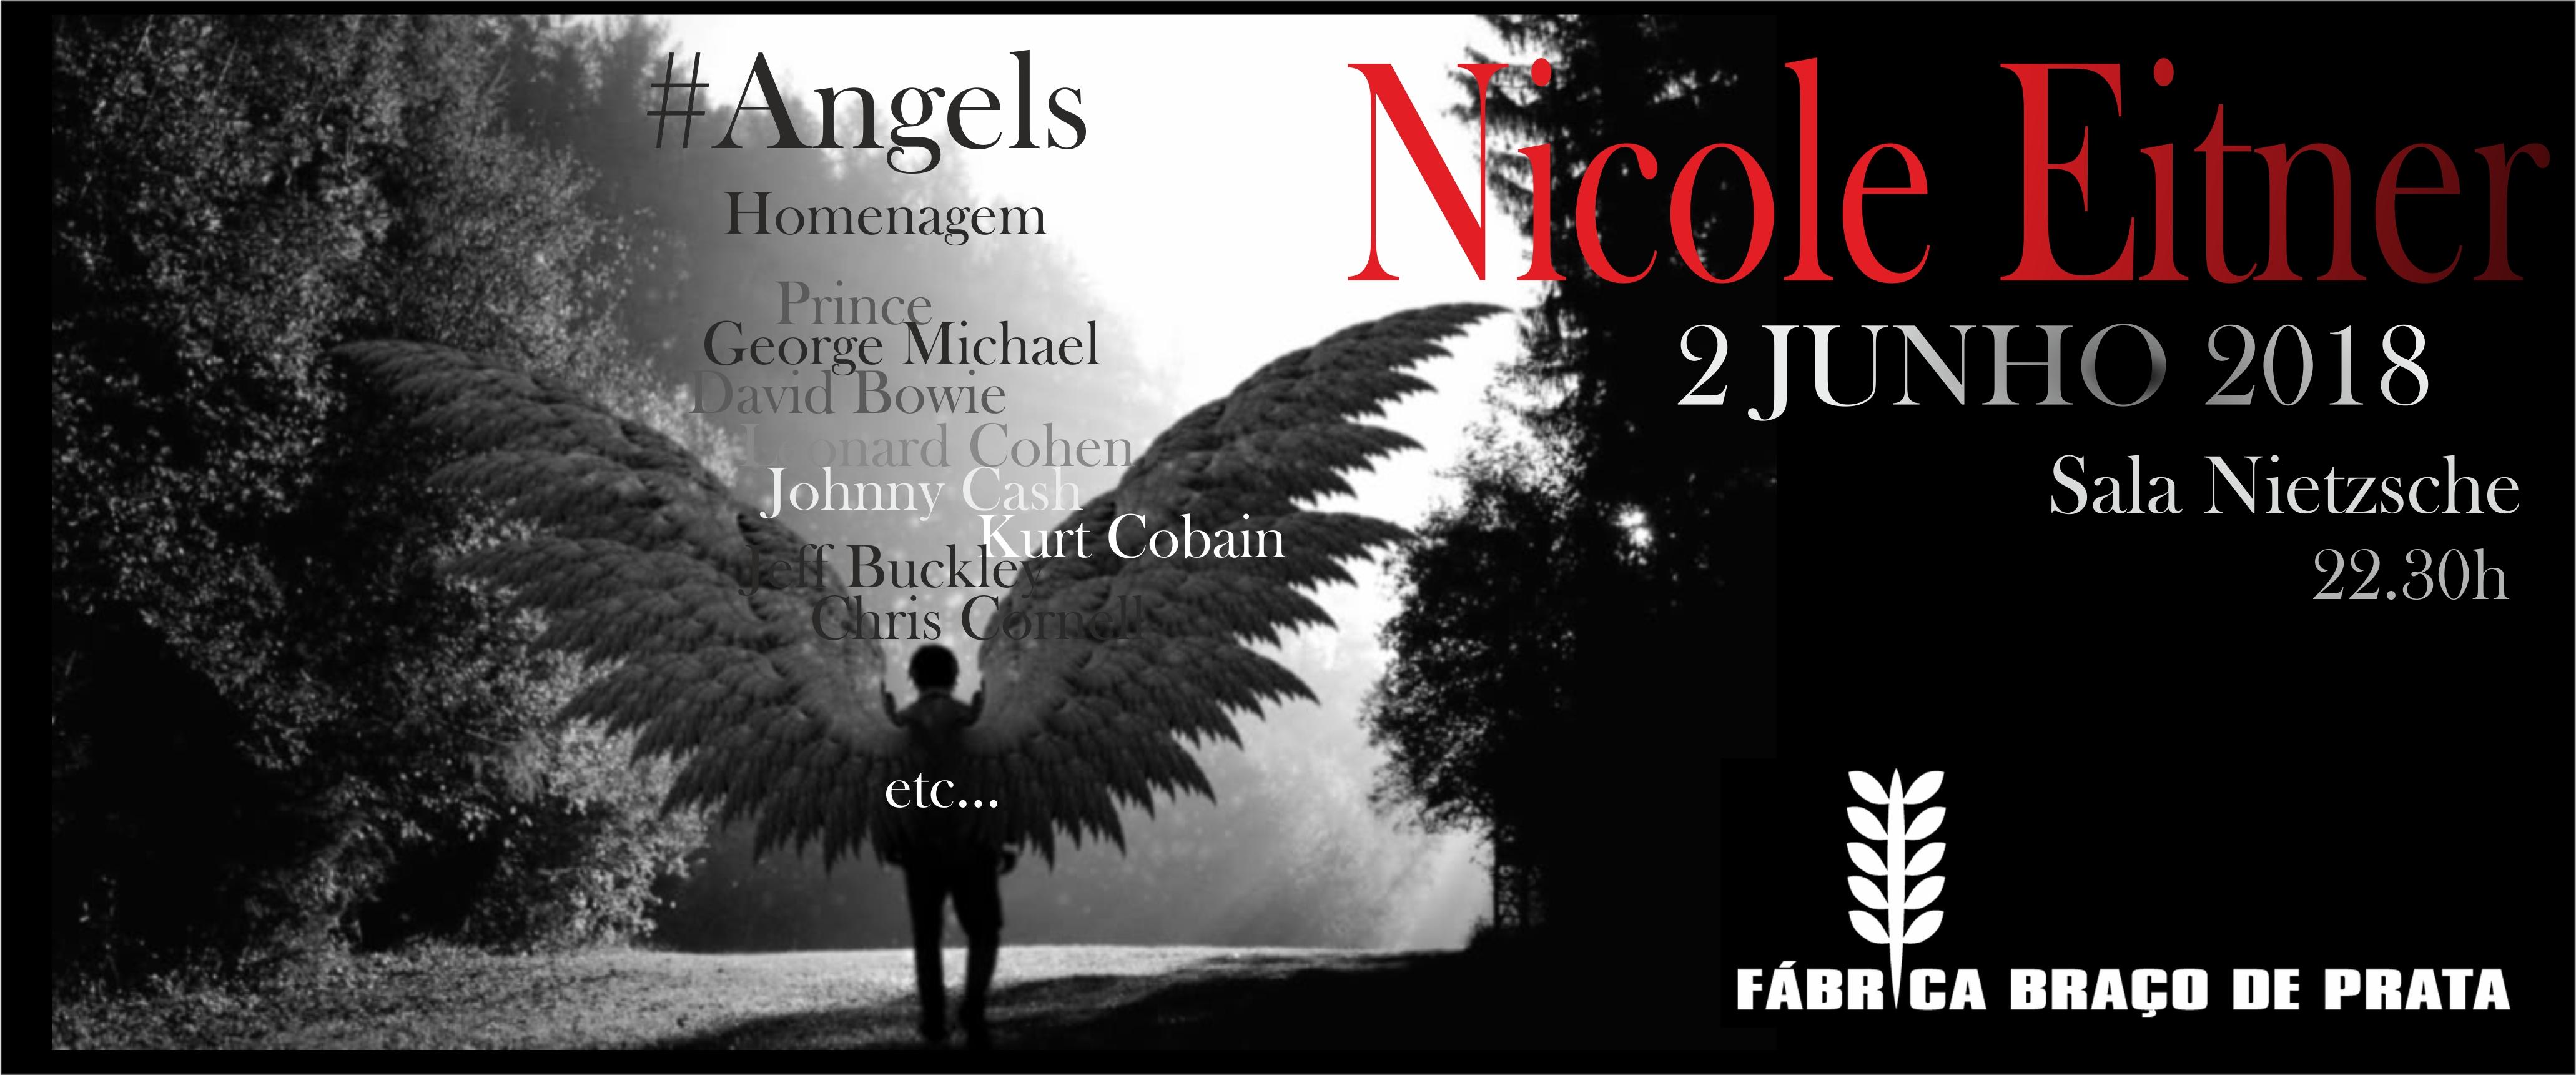 2 Junho Angels 2018